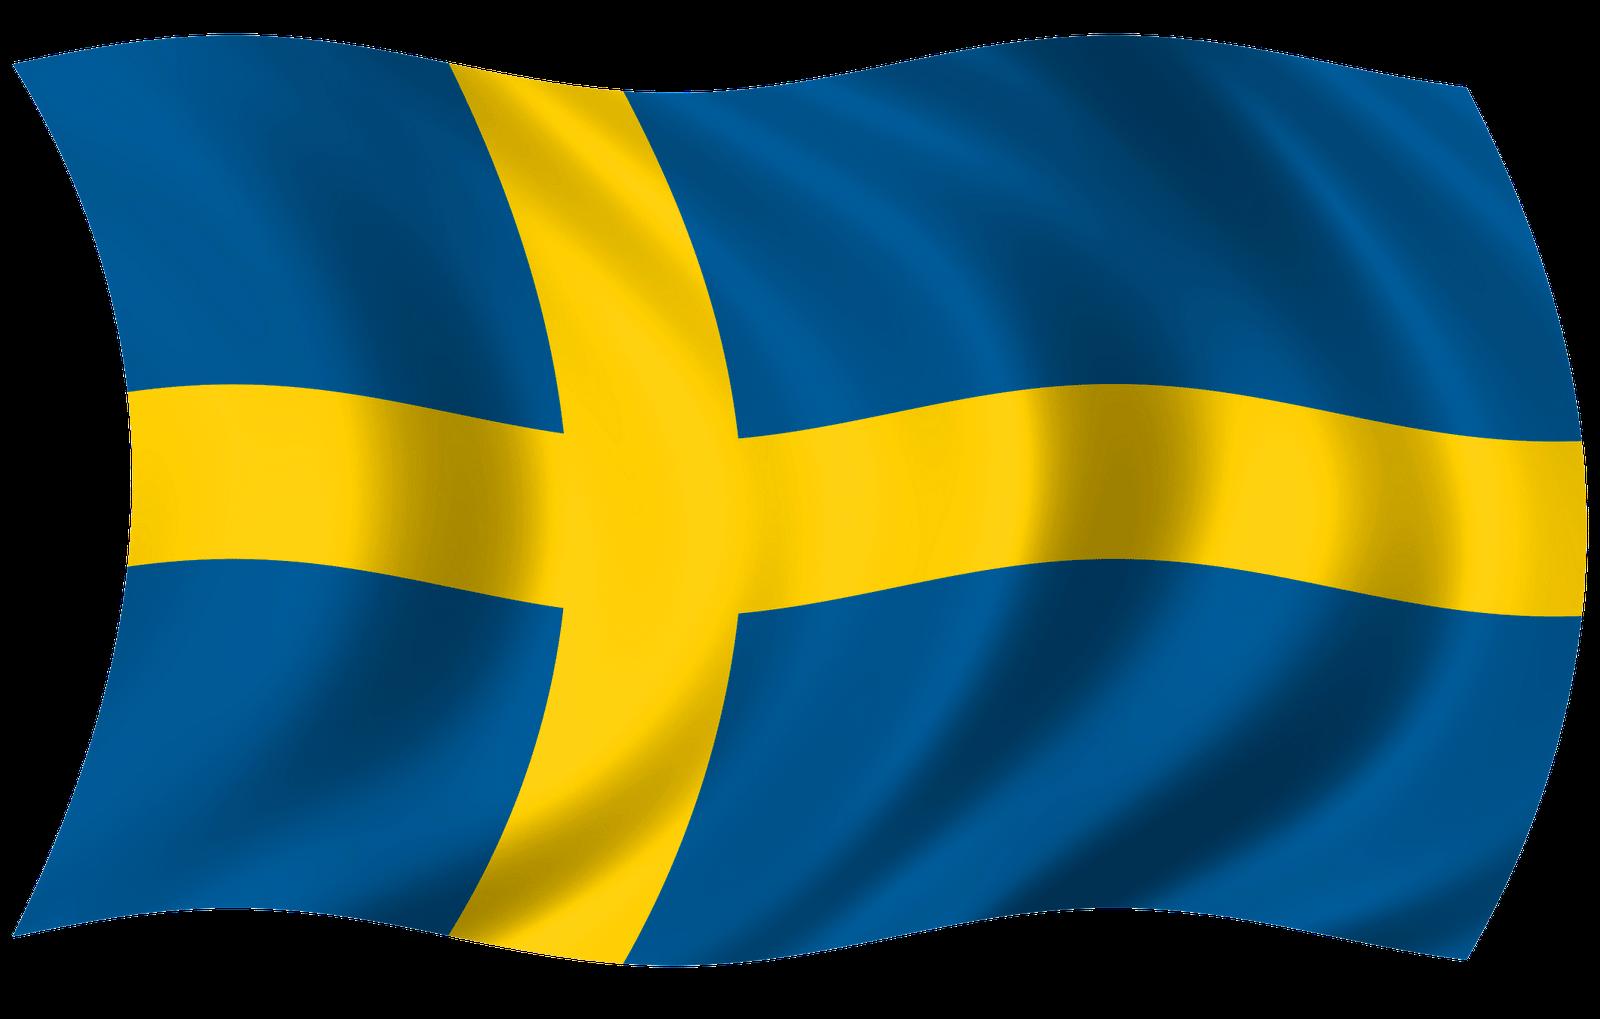 Chaînes IPTV Suède